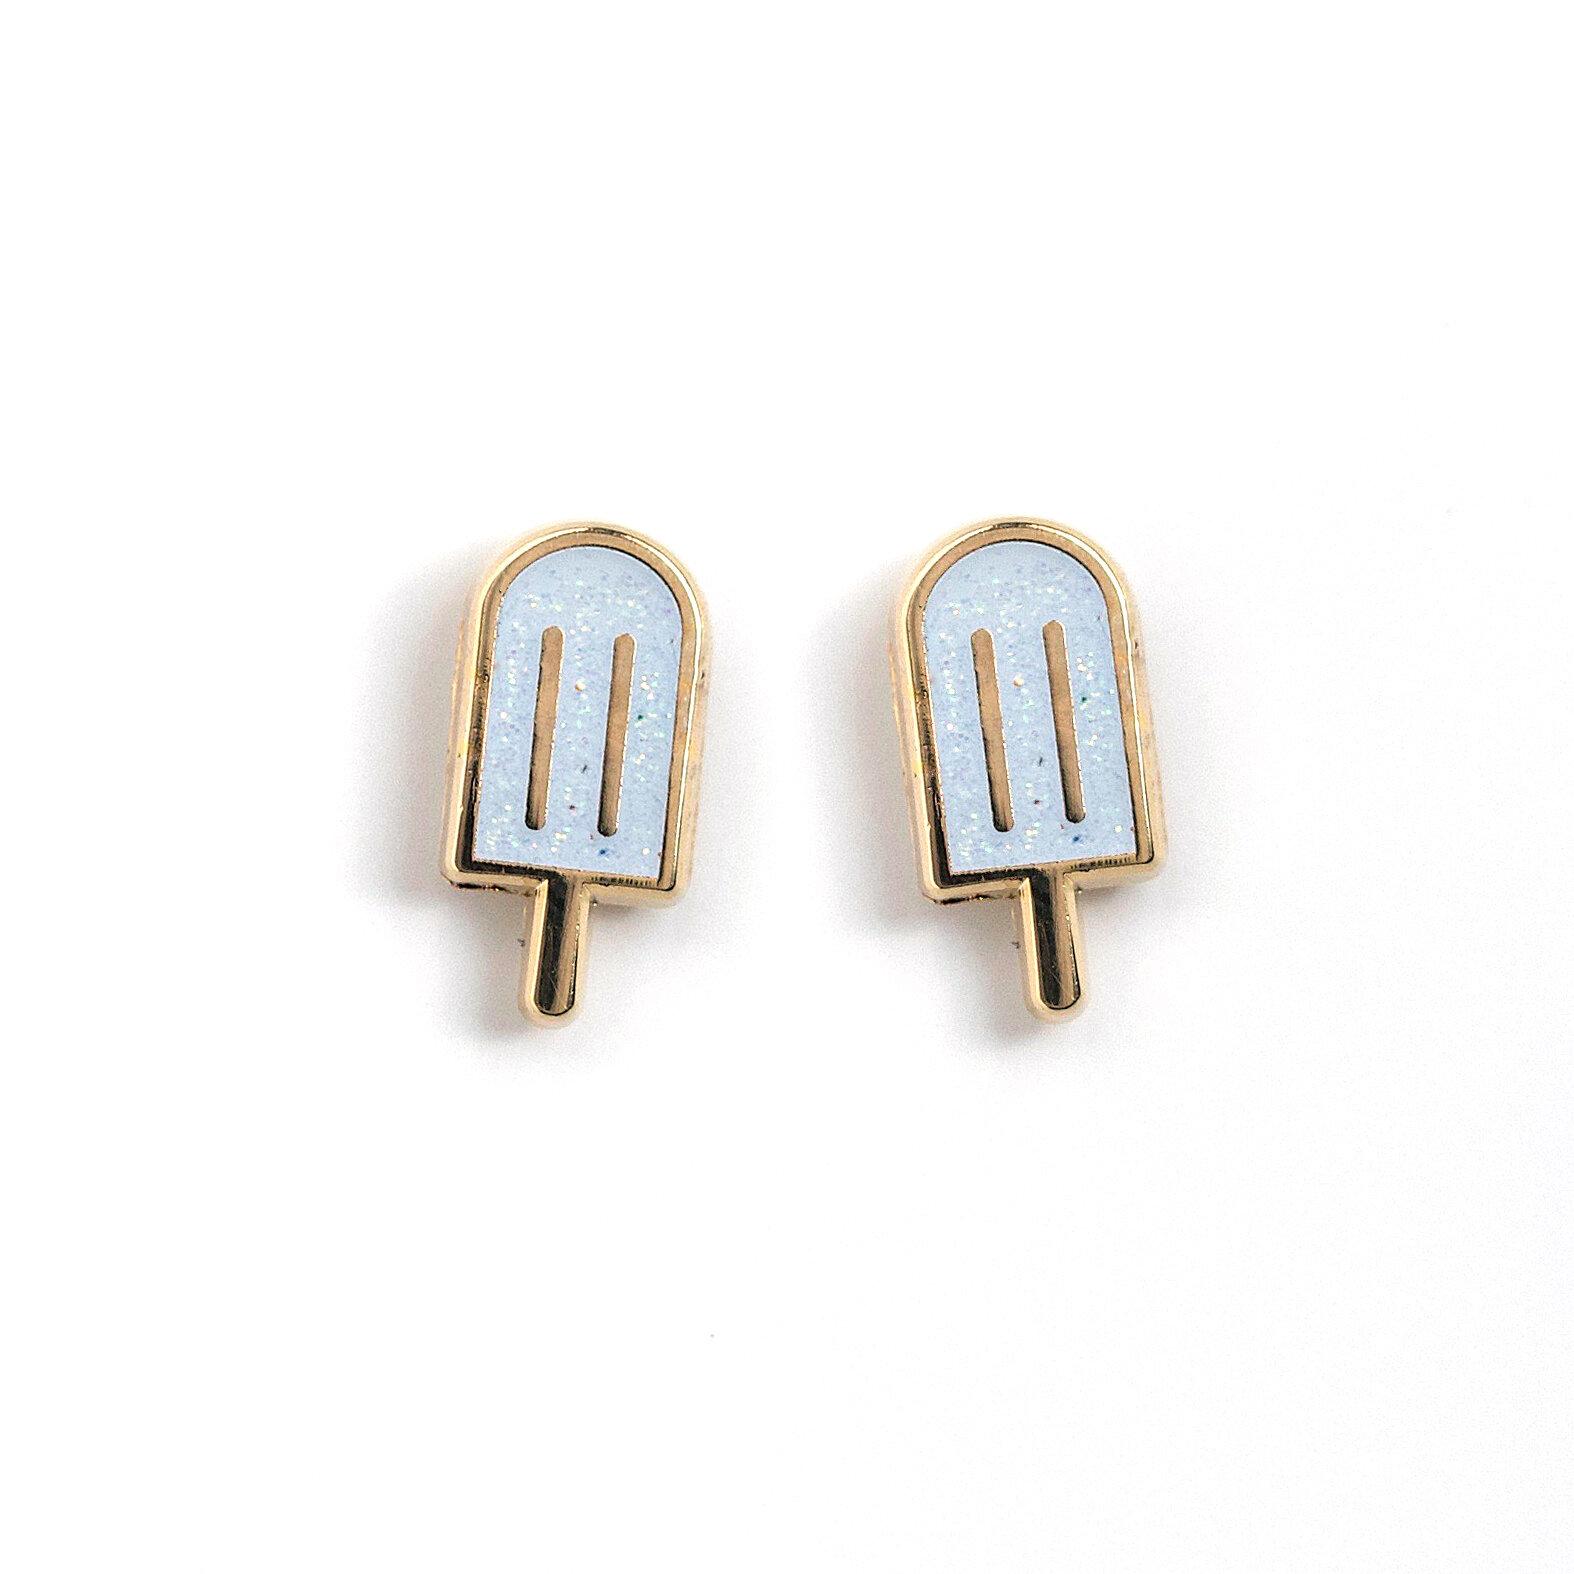 E11 - Glitter Popsicle Earrings